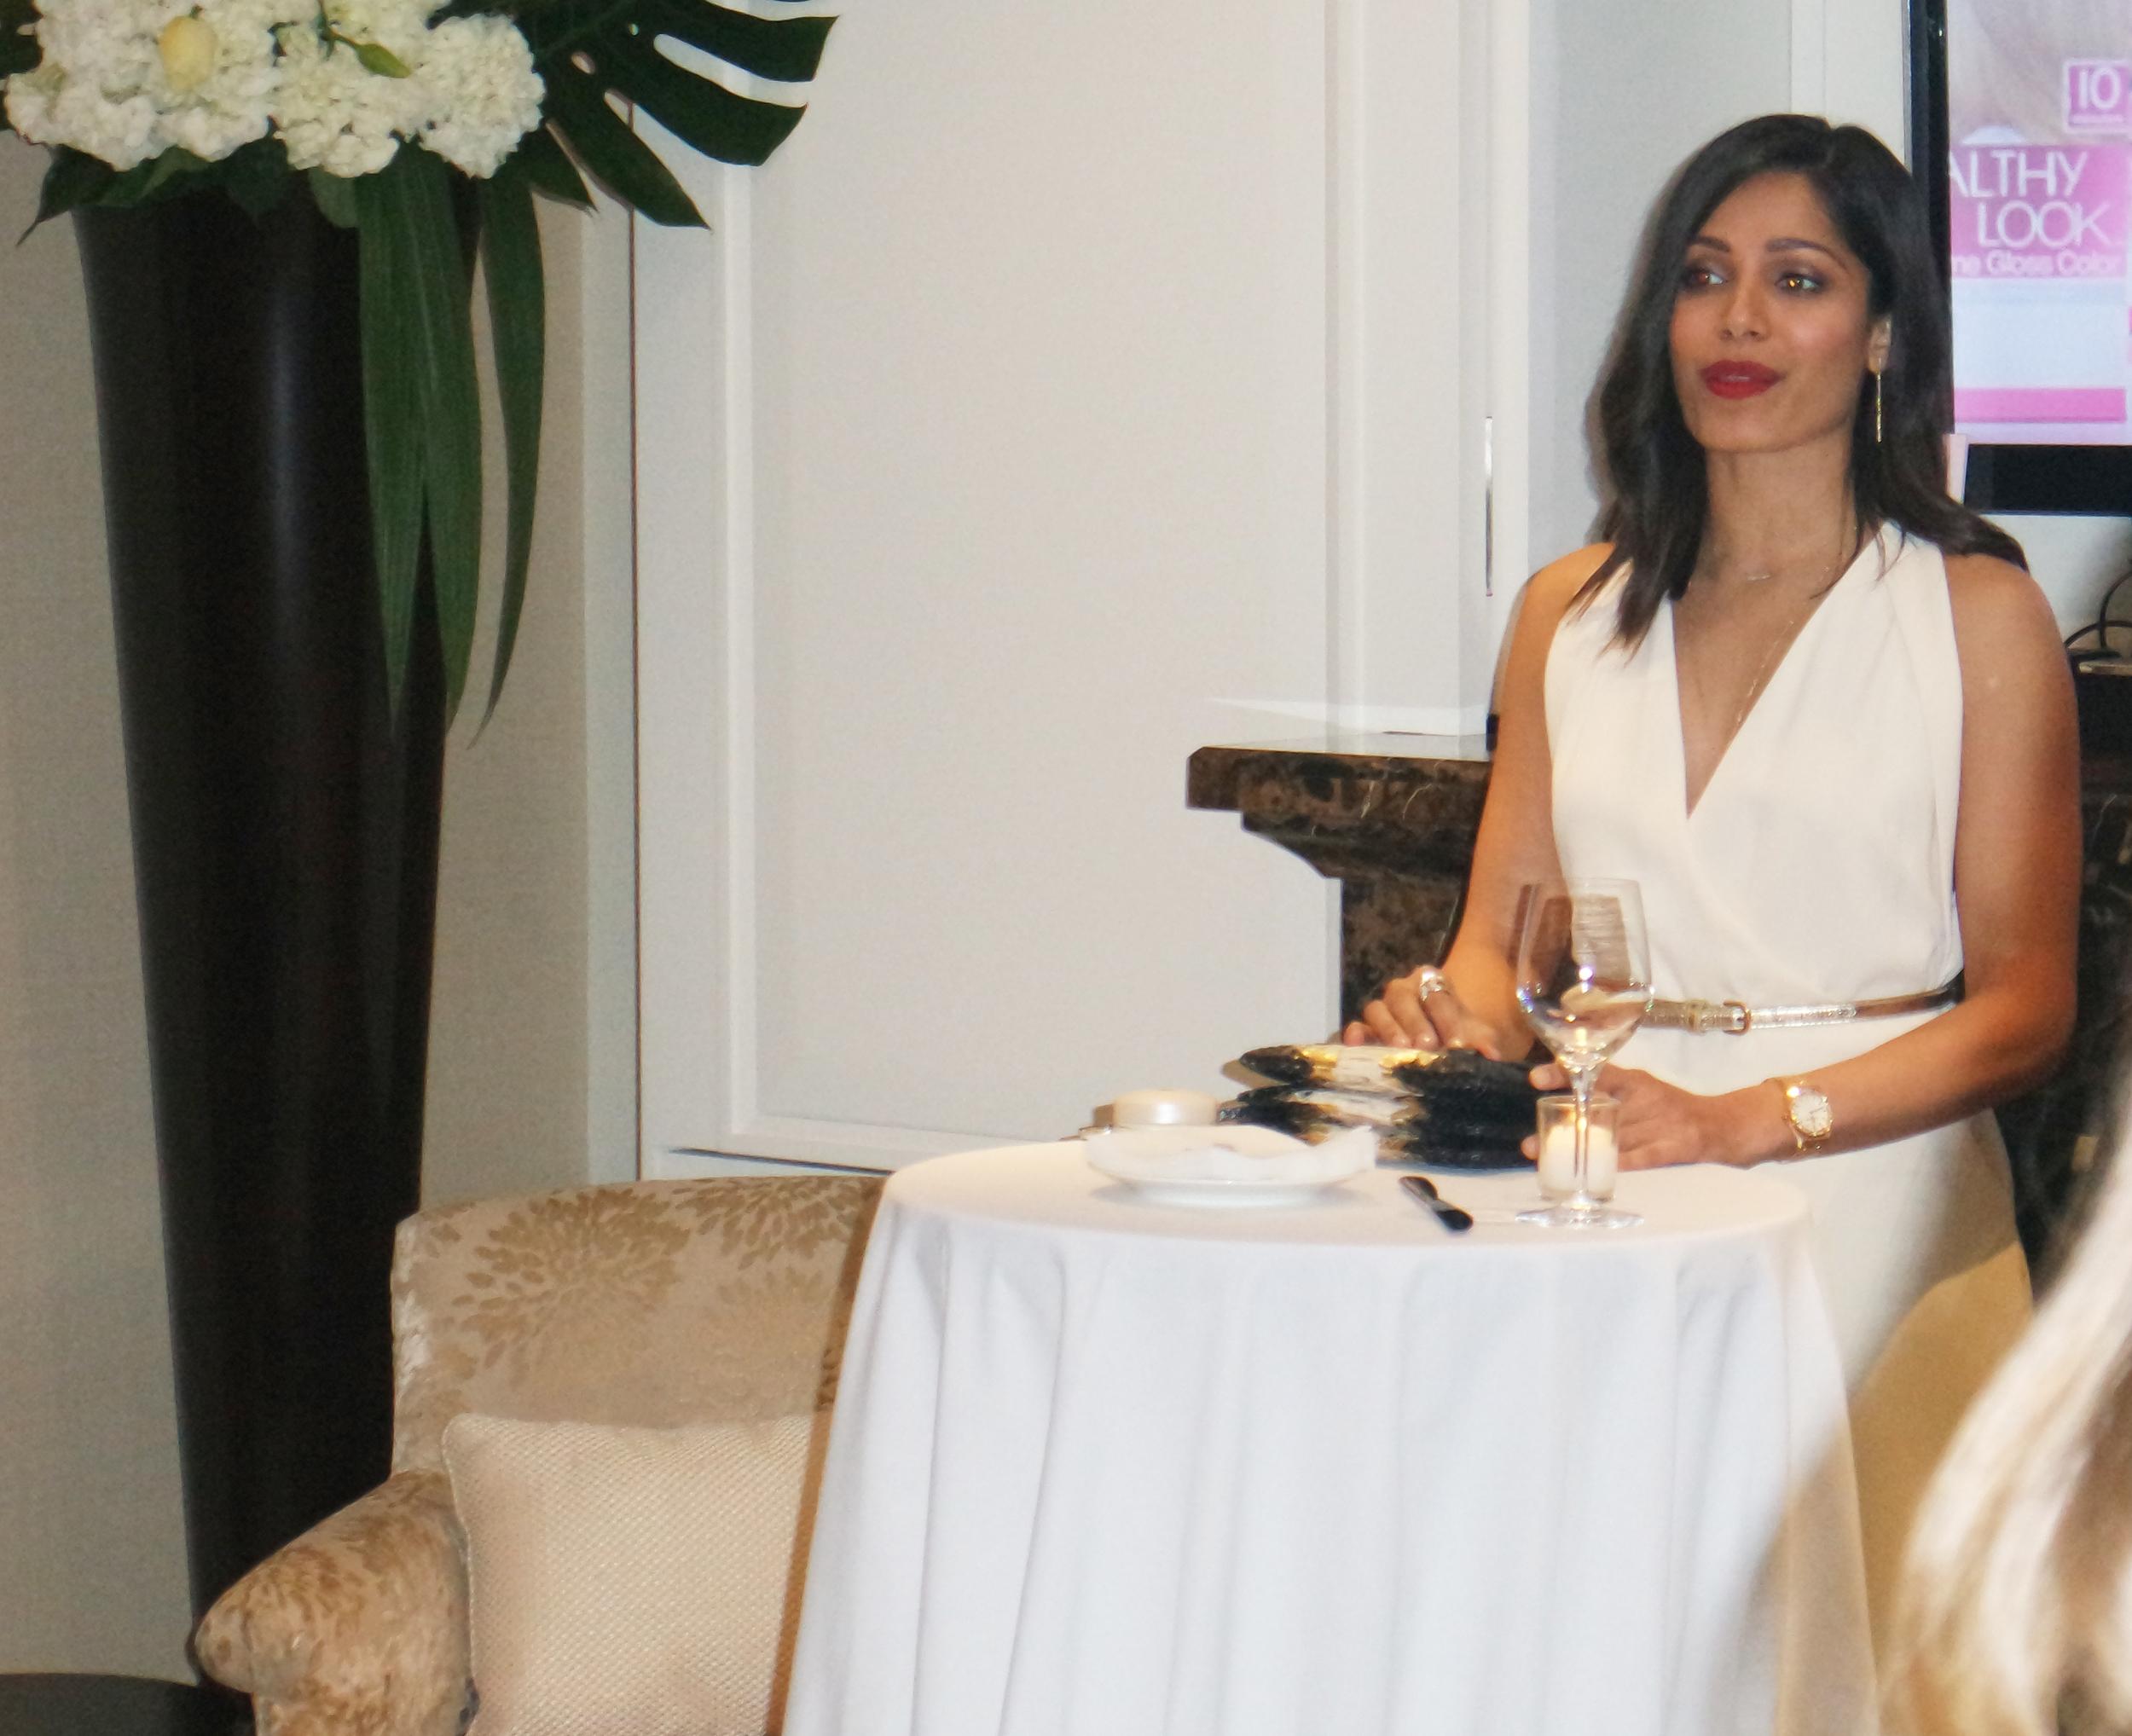 Freida Pino making a speech